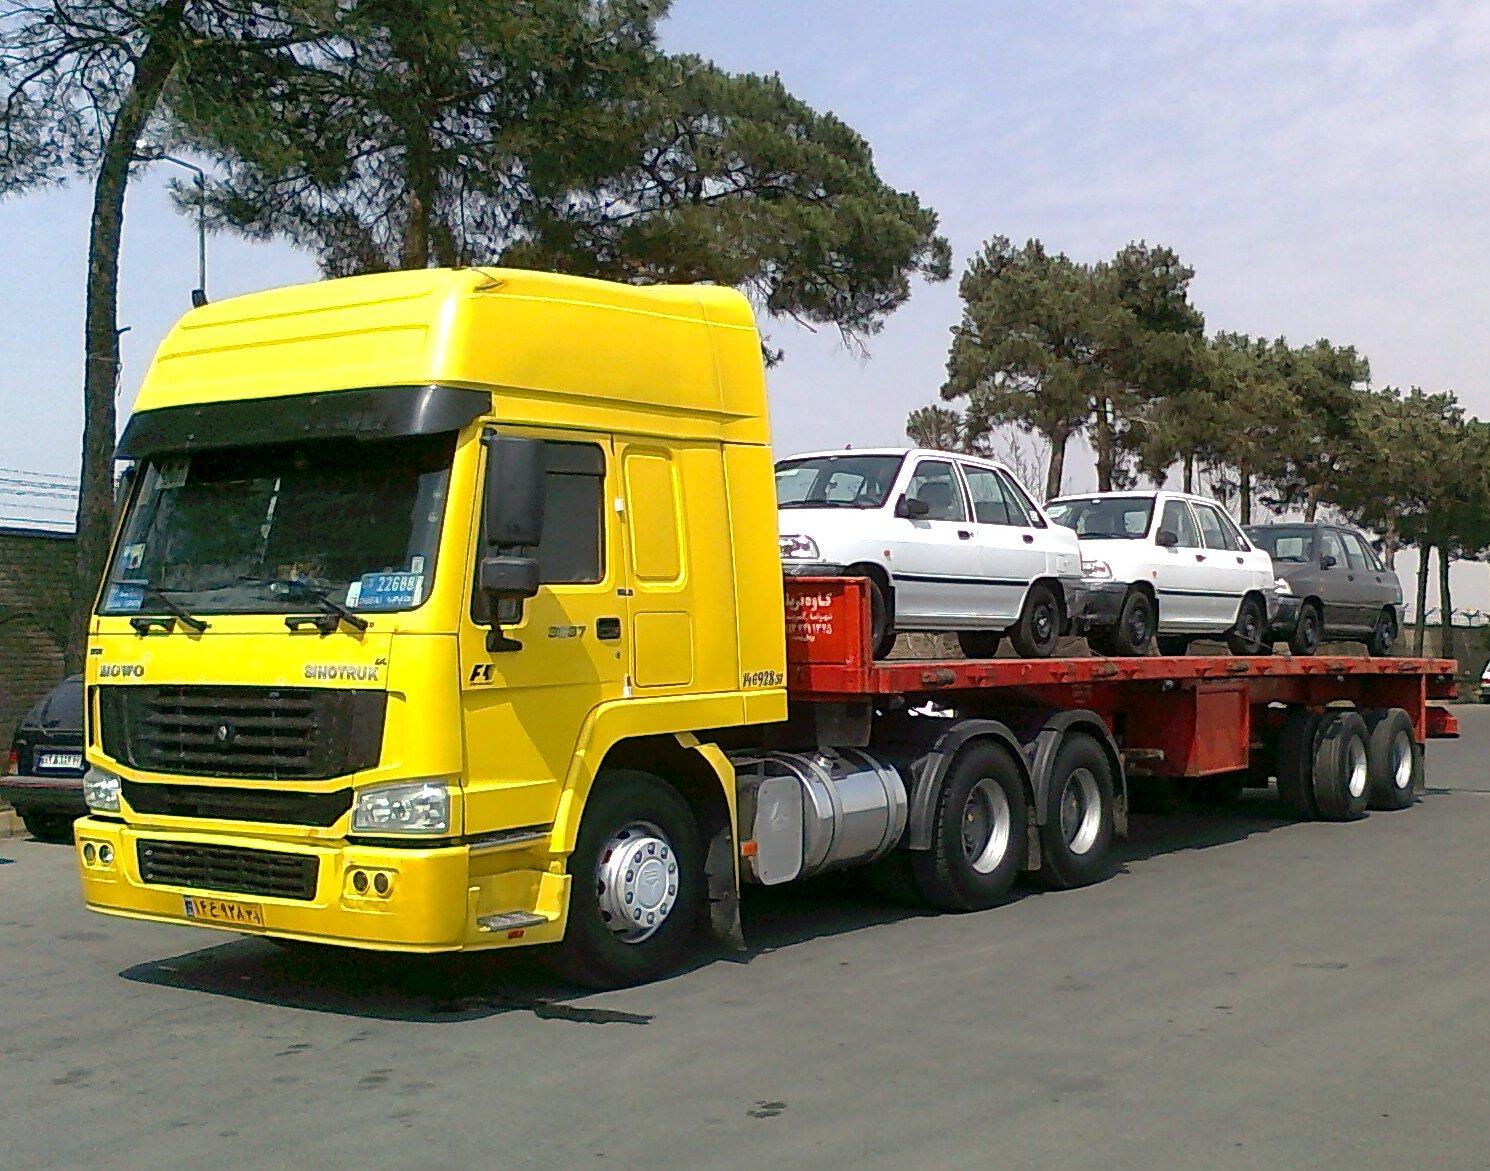 13990314000531 Test NewPhotoFree - خوب و بد طرح نوسازی ناوگان کامیونی/کامیون تولید داخل«واقعی» را با جان و دل میخریم